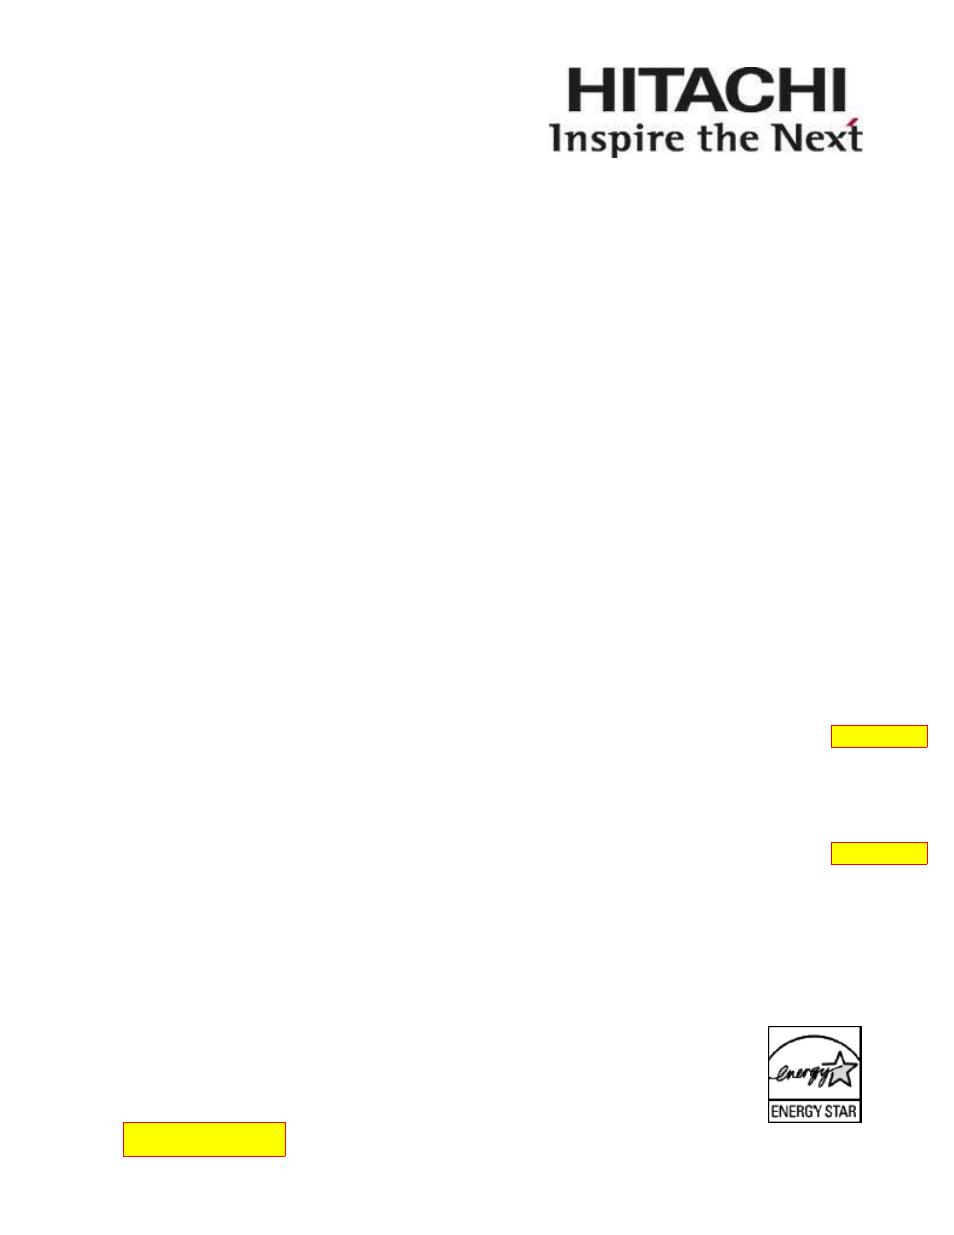 hitachi 42hdf52 user manual 50 pages rh manualsdir com Hitachi HDTV Manual Hitachi Ultravision Owner's Manual